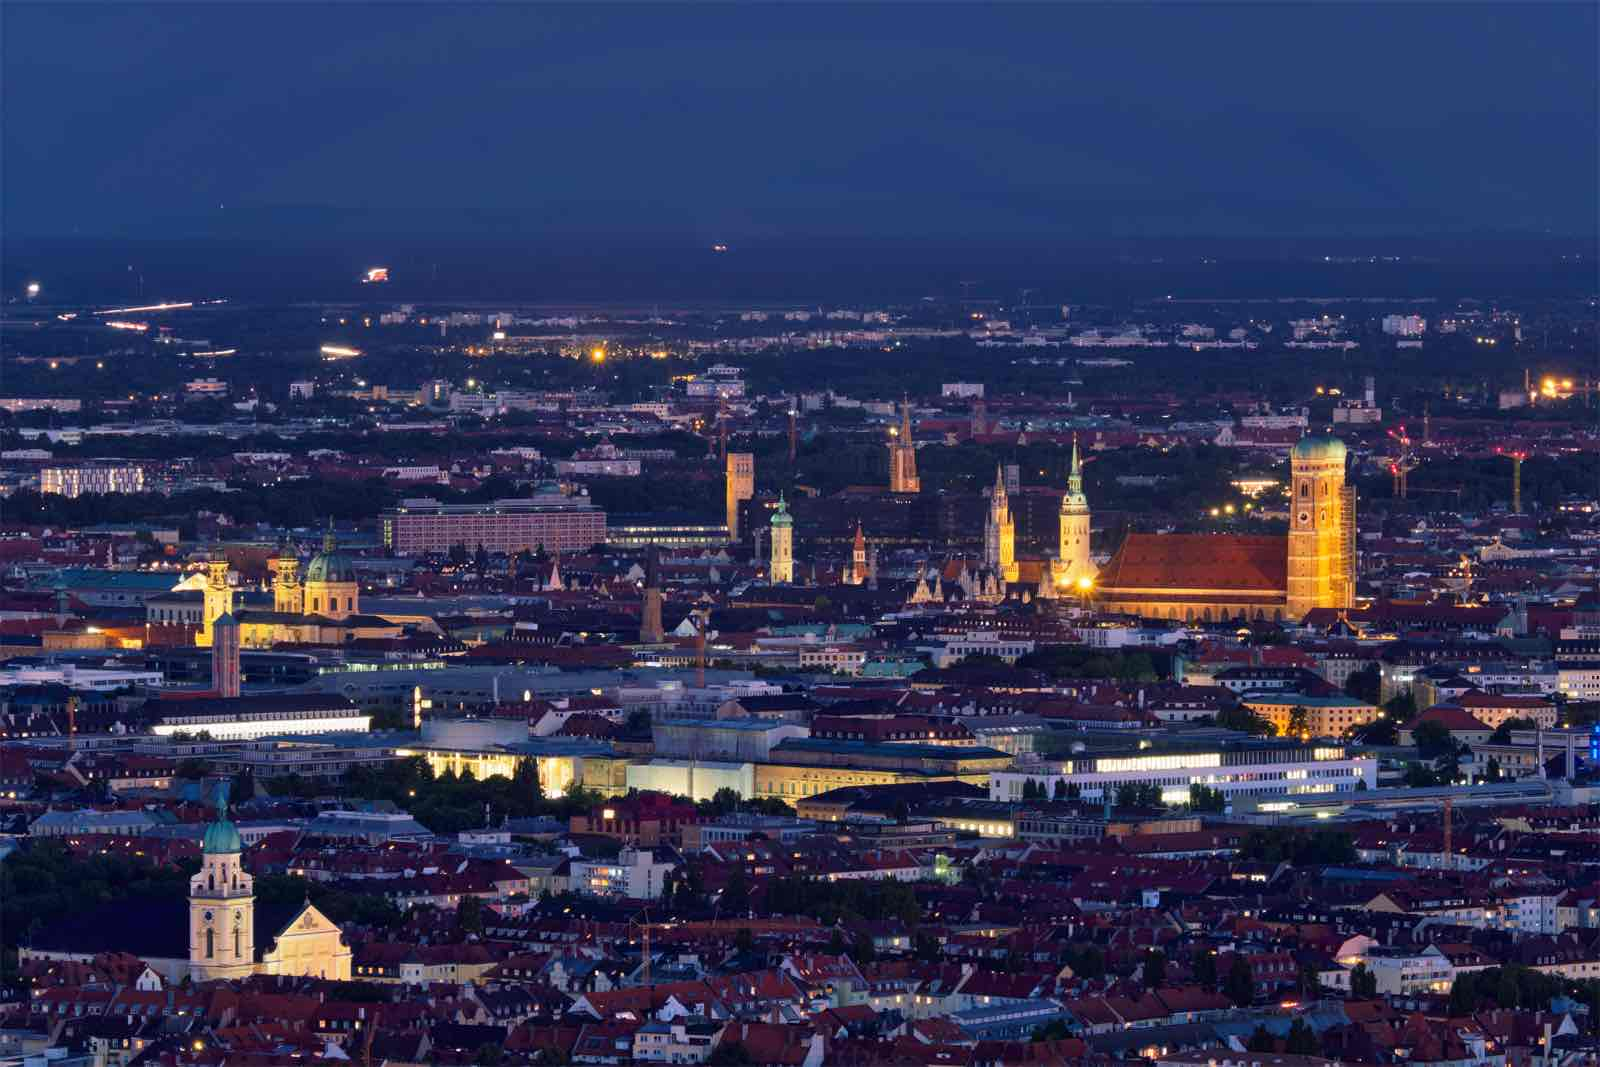 Hire Top Web & Mobile Development Team for Munich